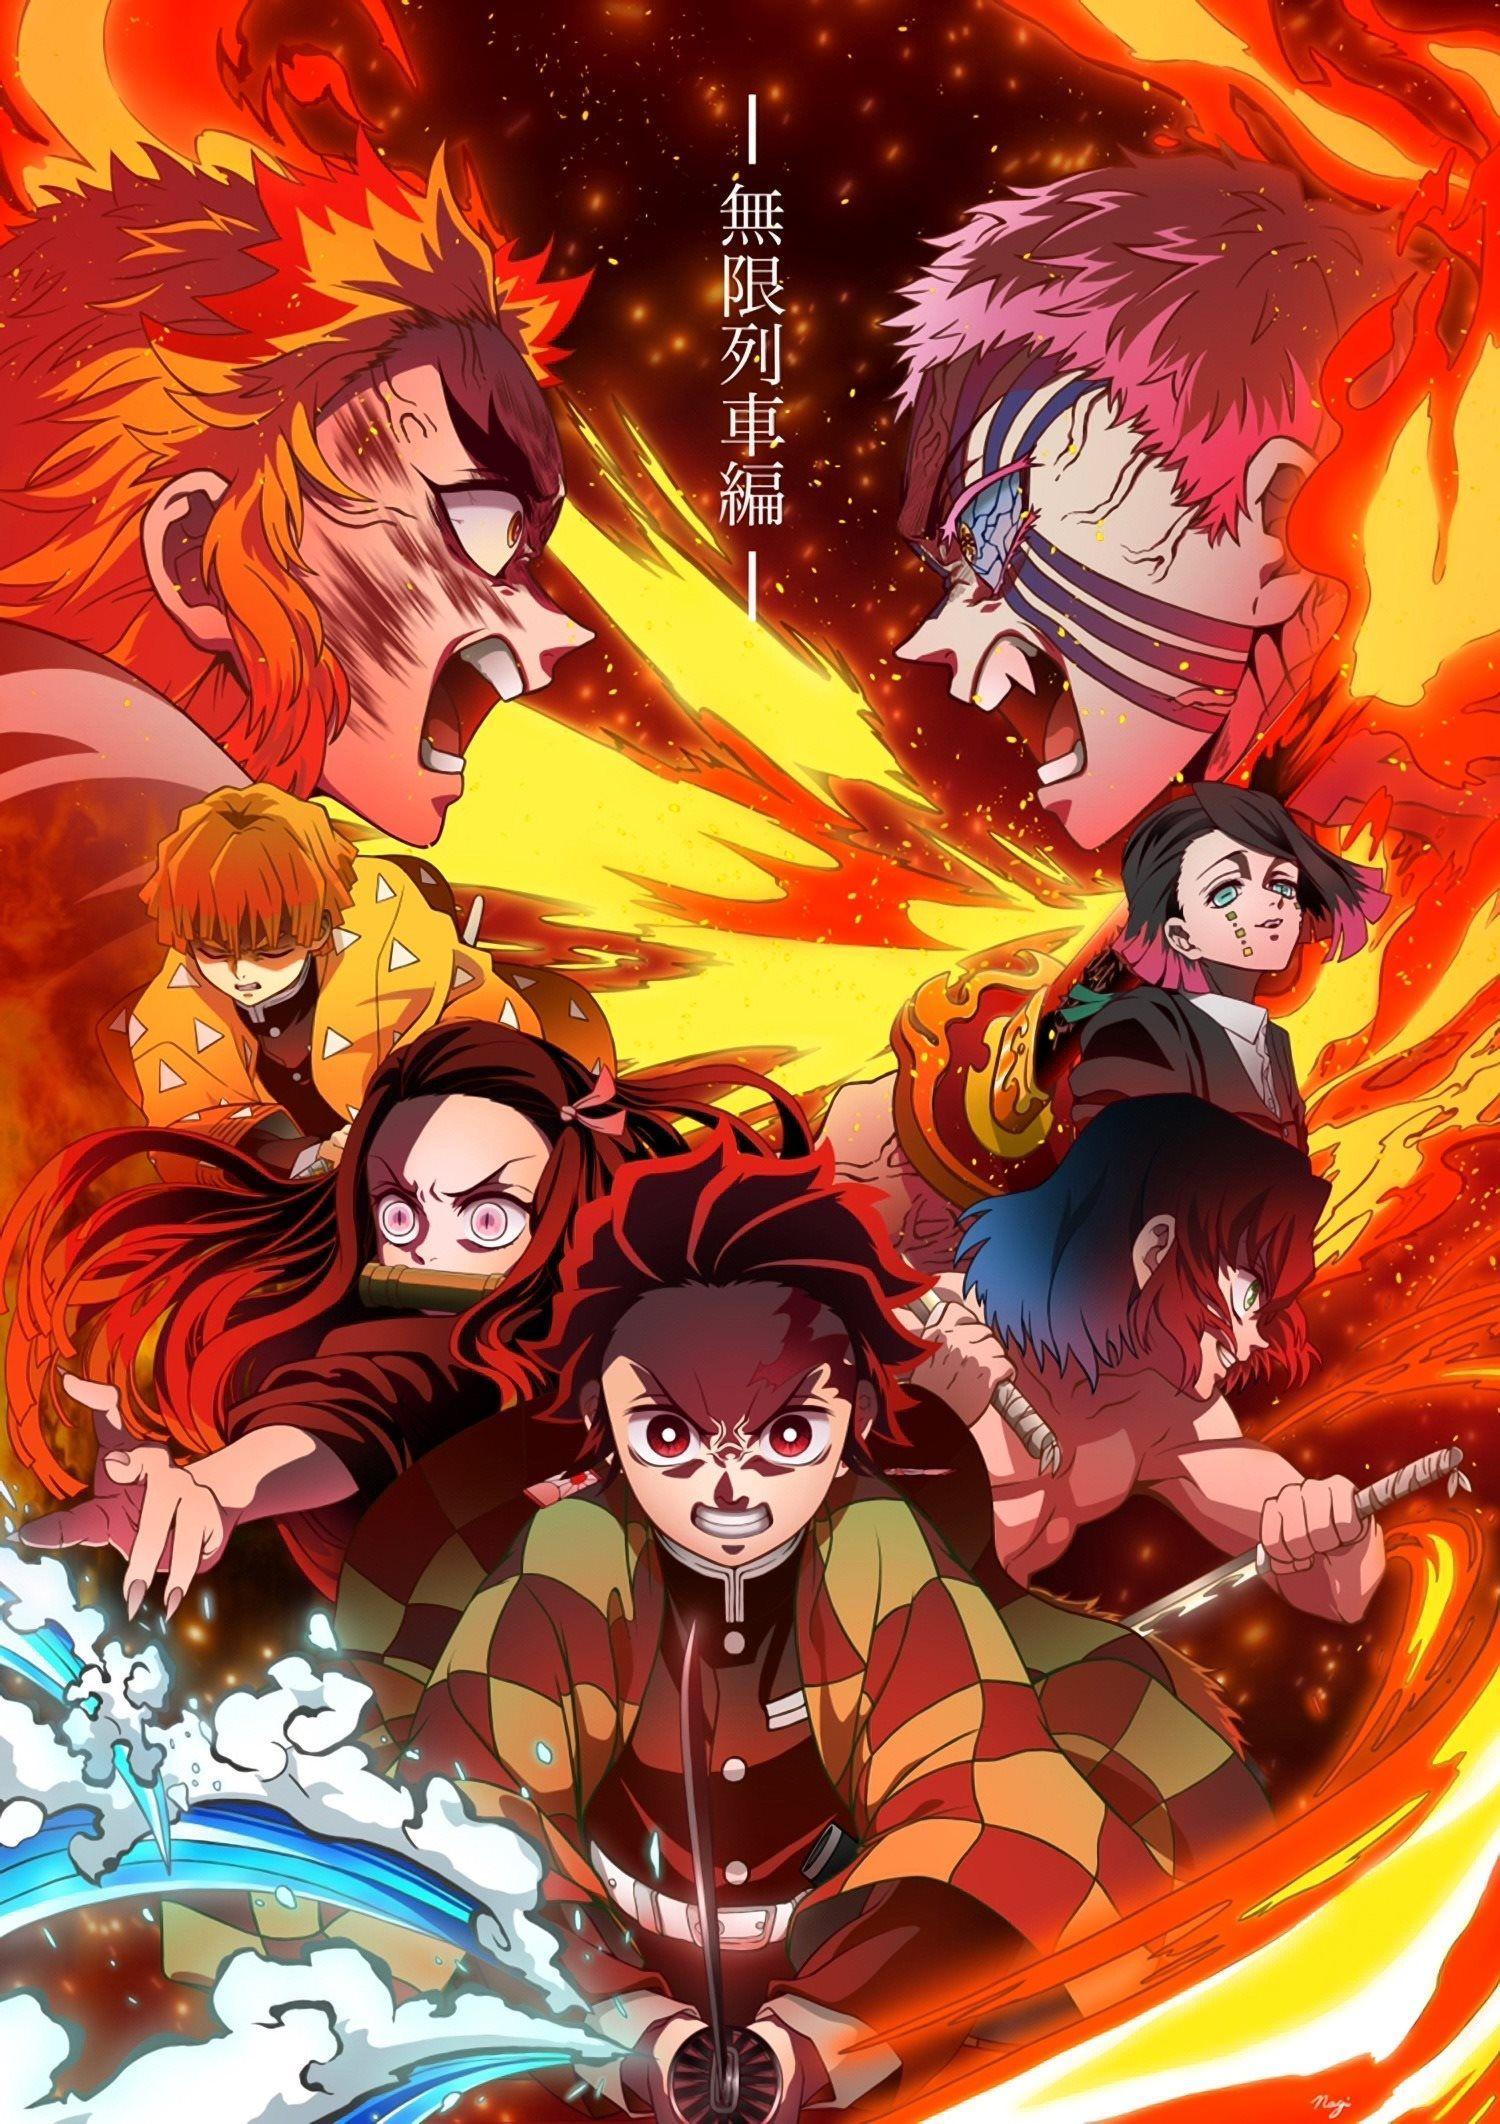 Kimetsu No Yaiba Pelicula Completa En Espanol Latino Sub Espanol Anime Anime Demon Anime Movies